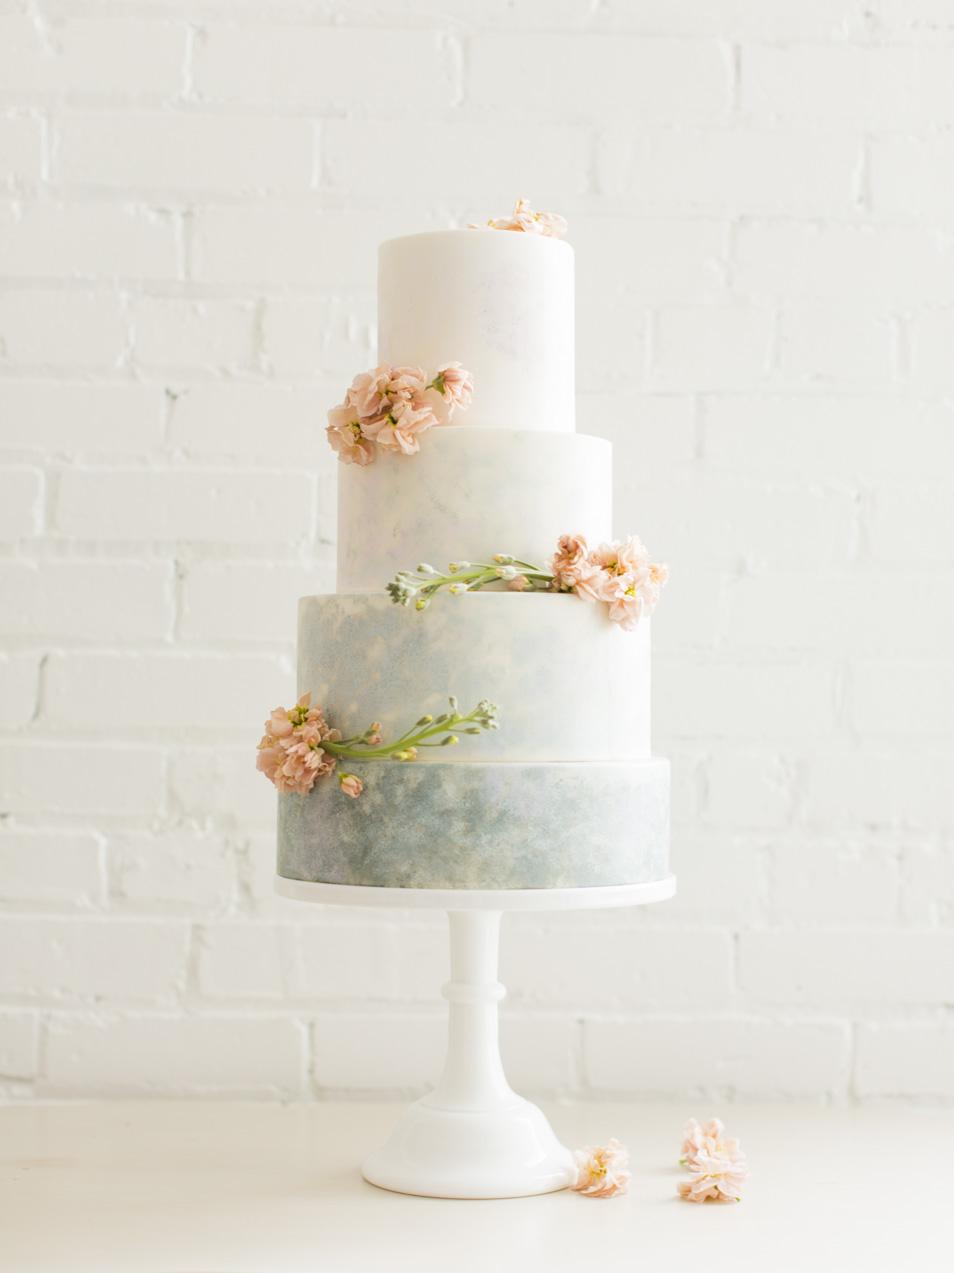 Monet Inspired Wedding Cake | Michelle Leo Events